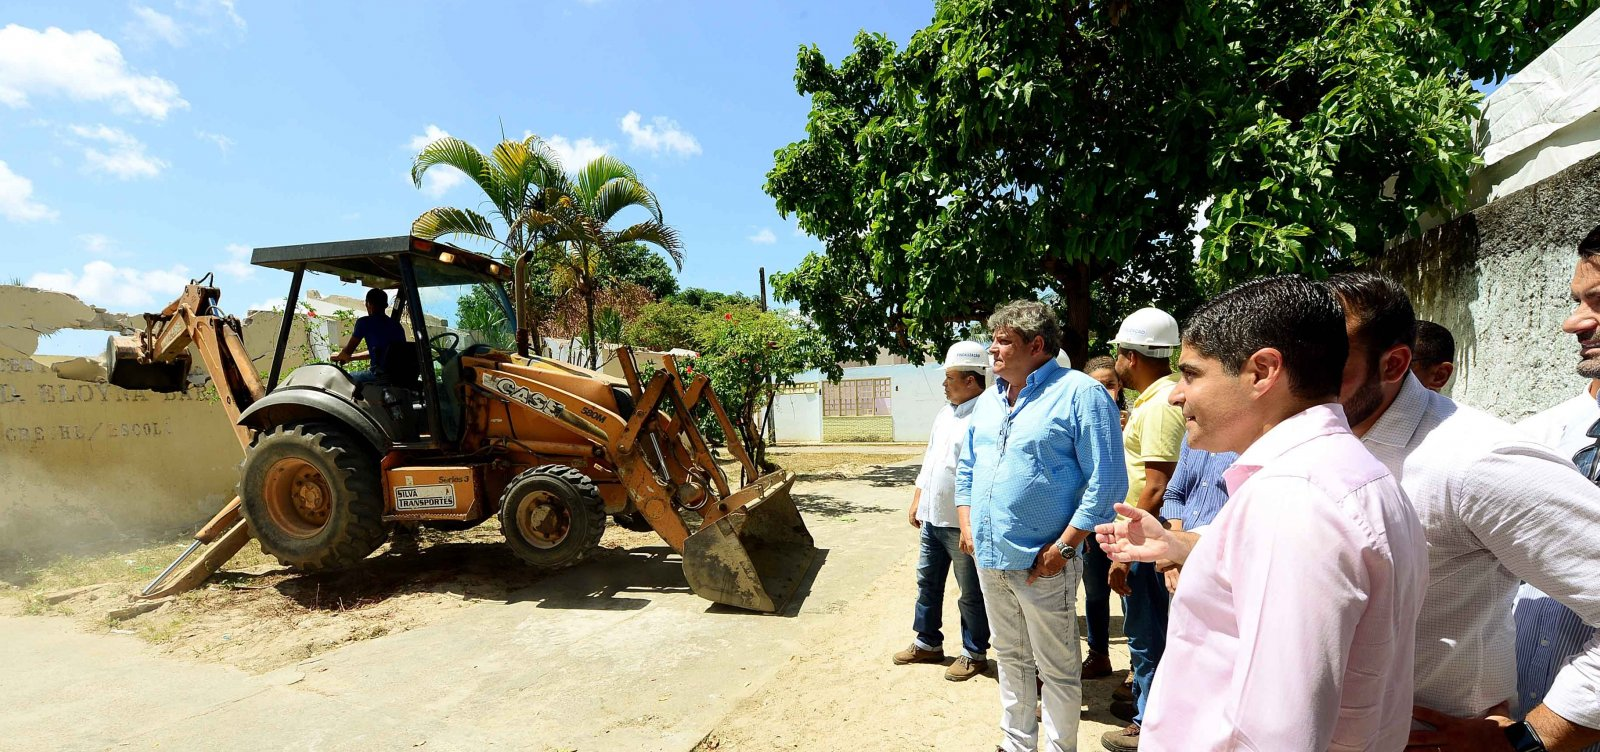 [Escola municipal será reconstruída e vai oferecer 770 vagas para estudantes]